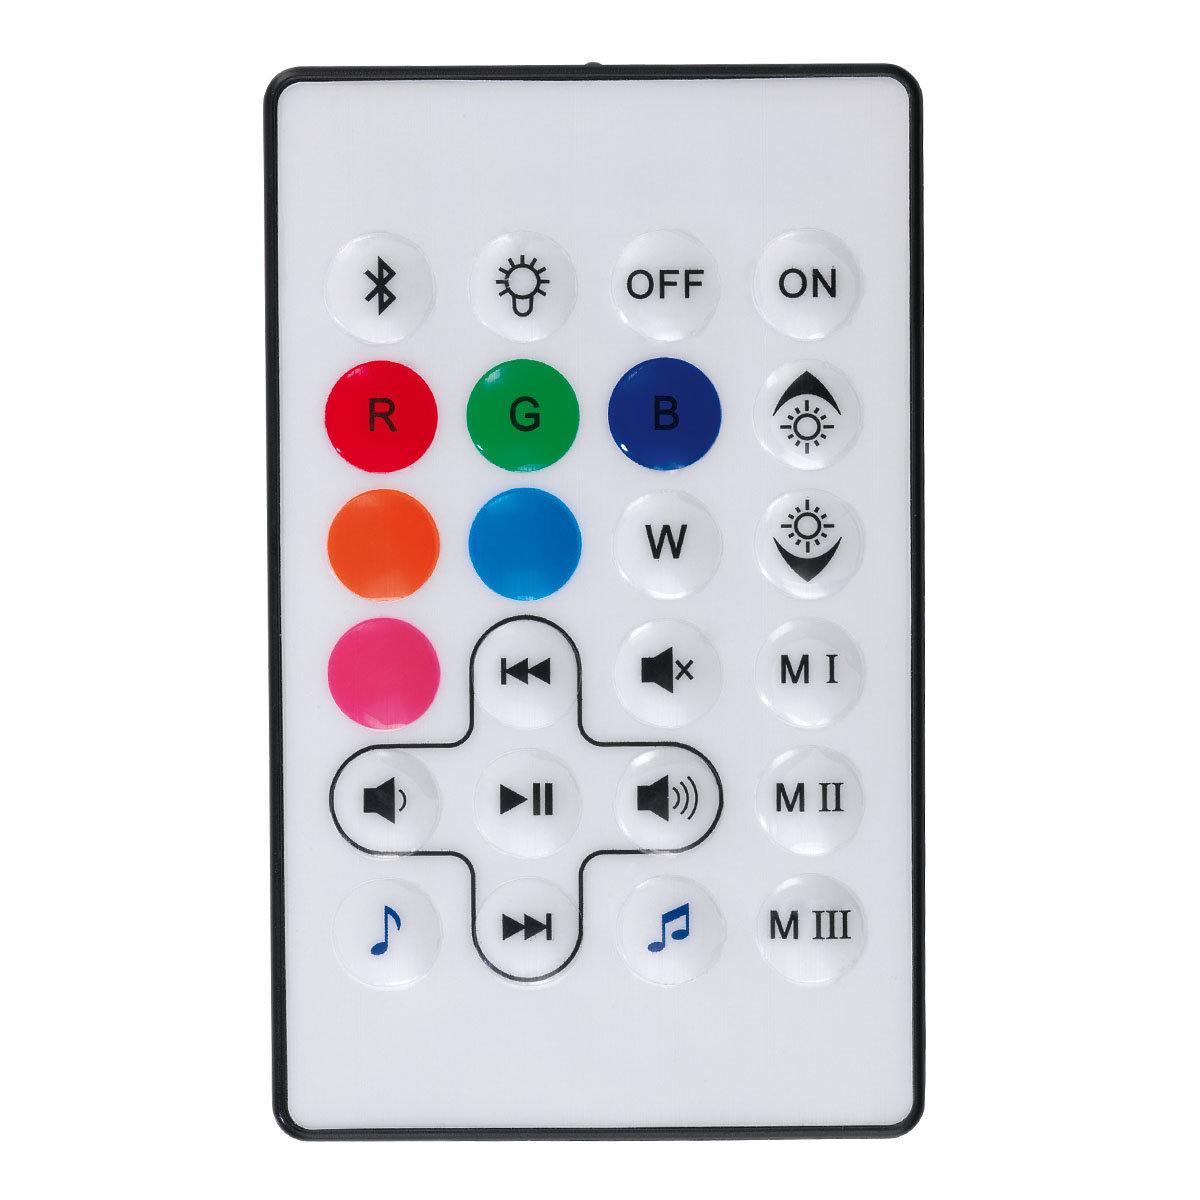 LED-Bluetooth-Lautsprecher | #2